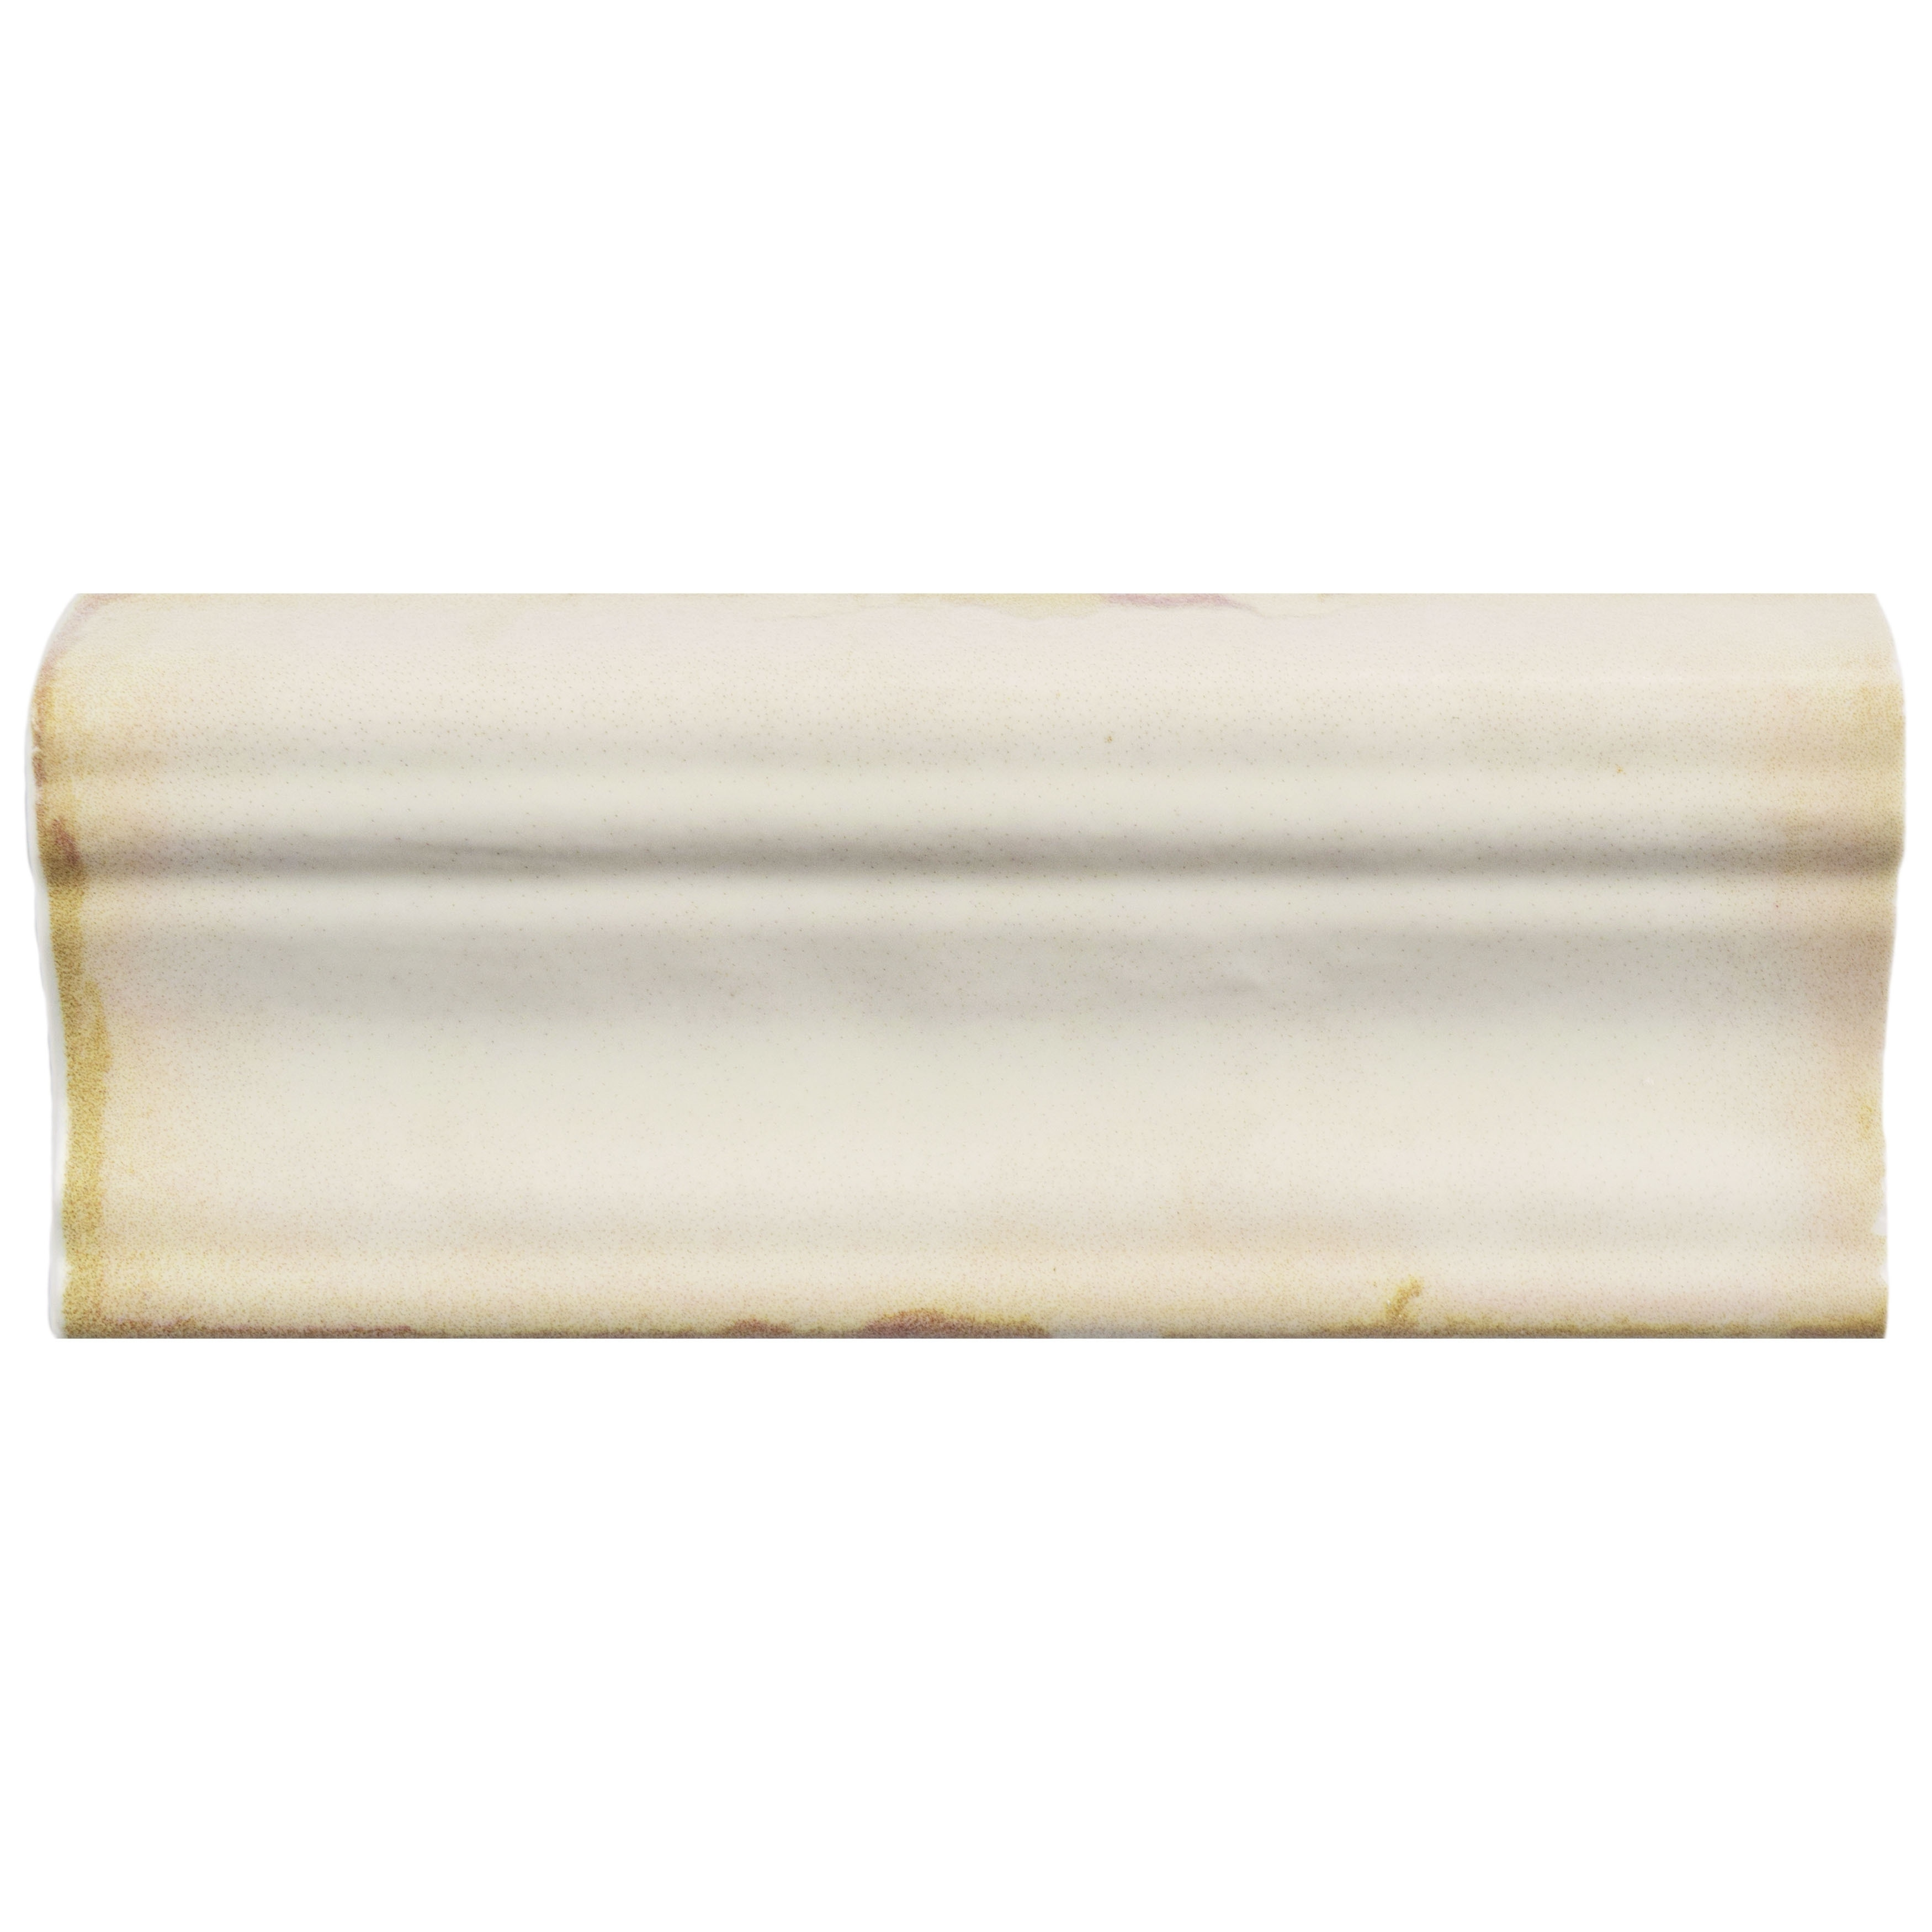 Shop Somertile 2x475 Inch Chronicle Moldura Ceramic Wall Trim Tile